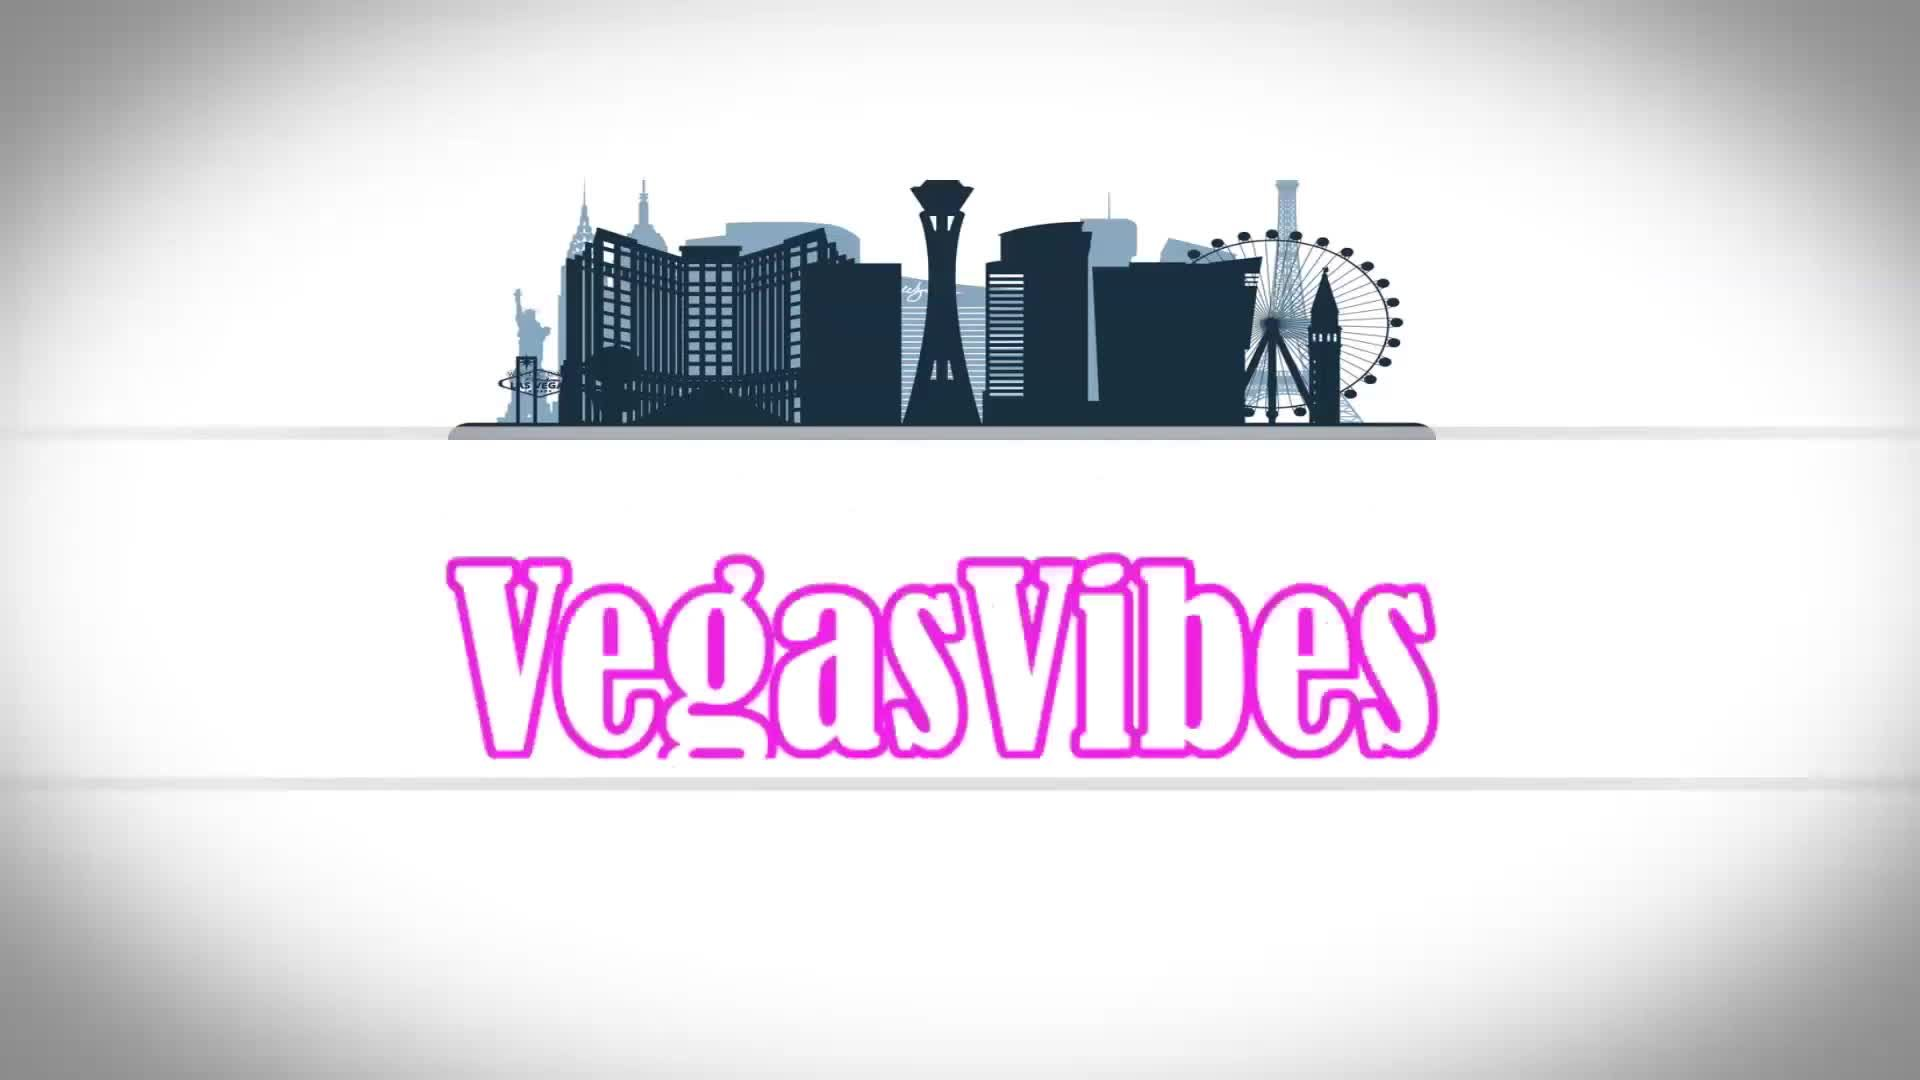 VEGASLIFETV-ACTV-VEGASVIBES S8_Deborah Alexander